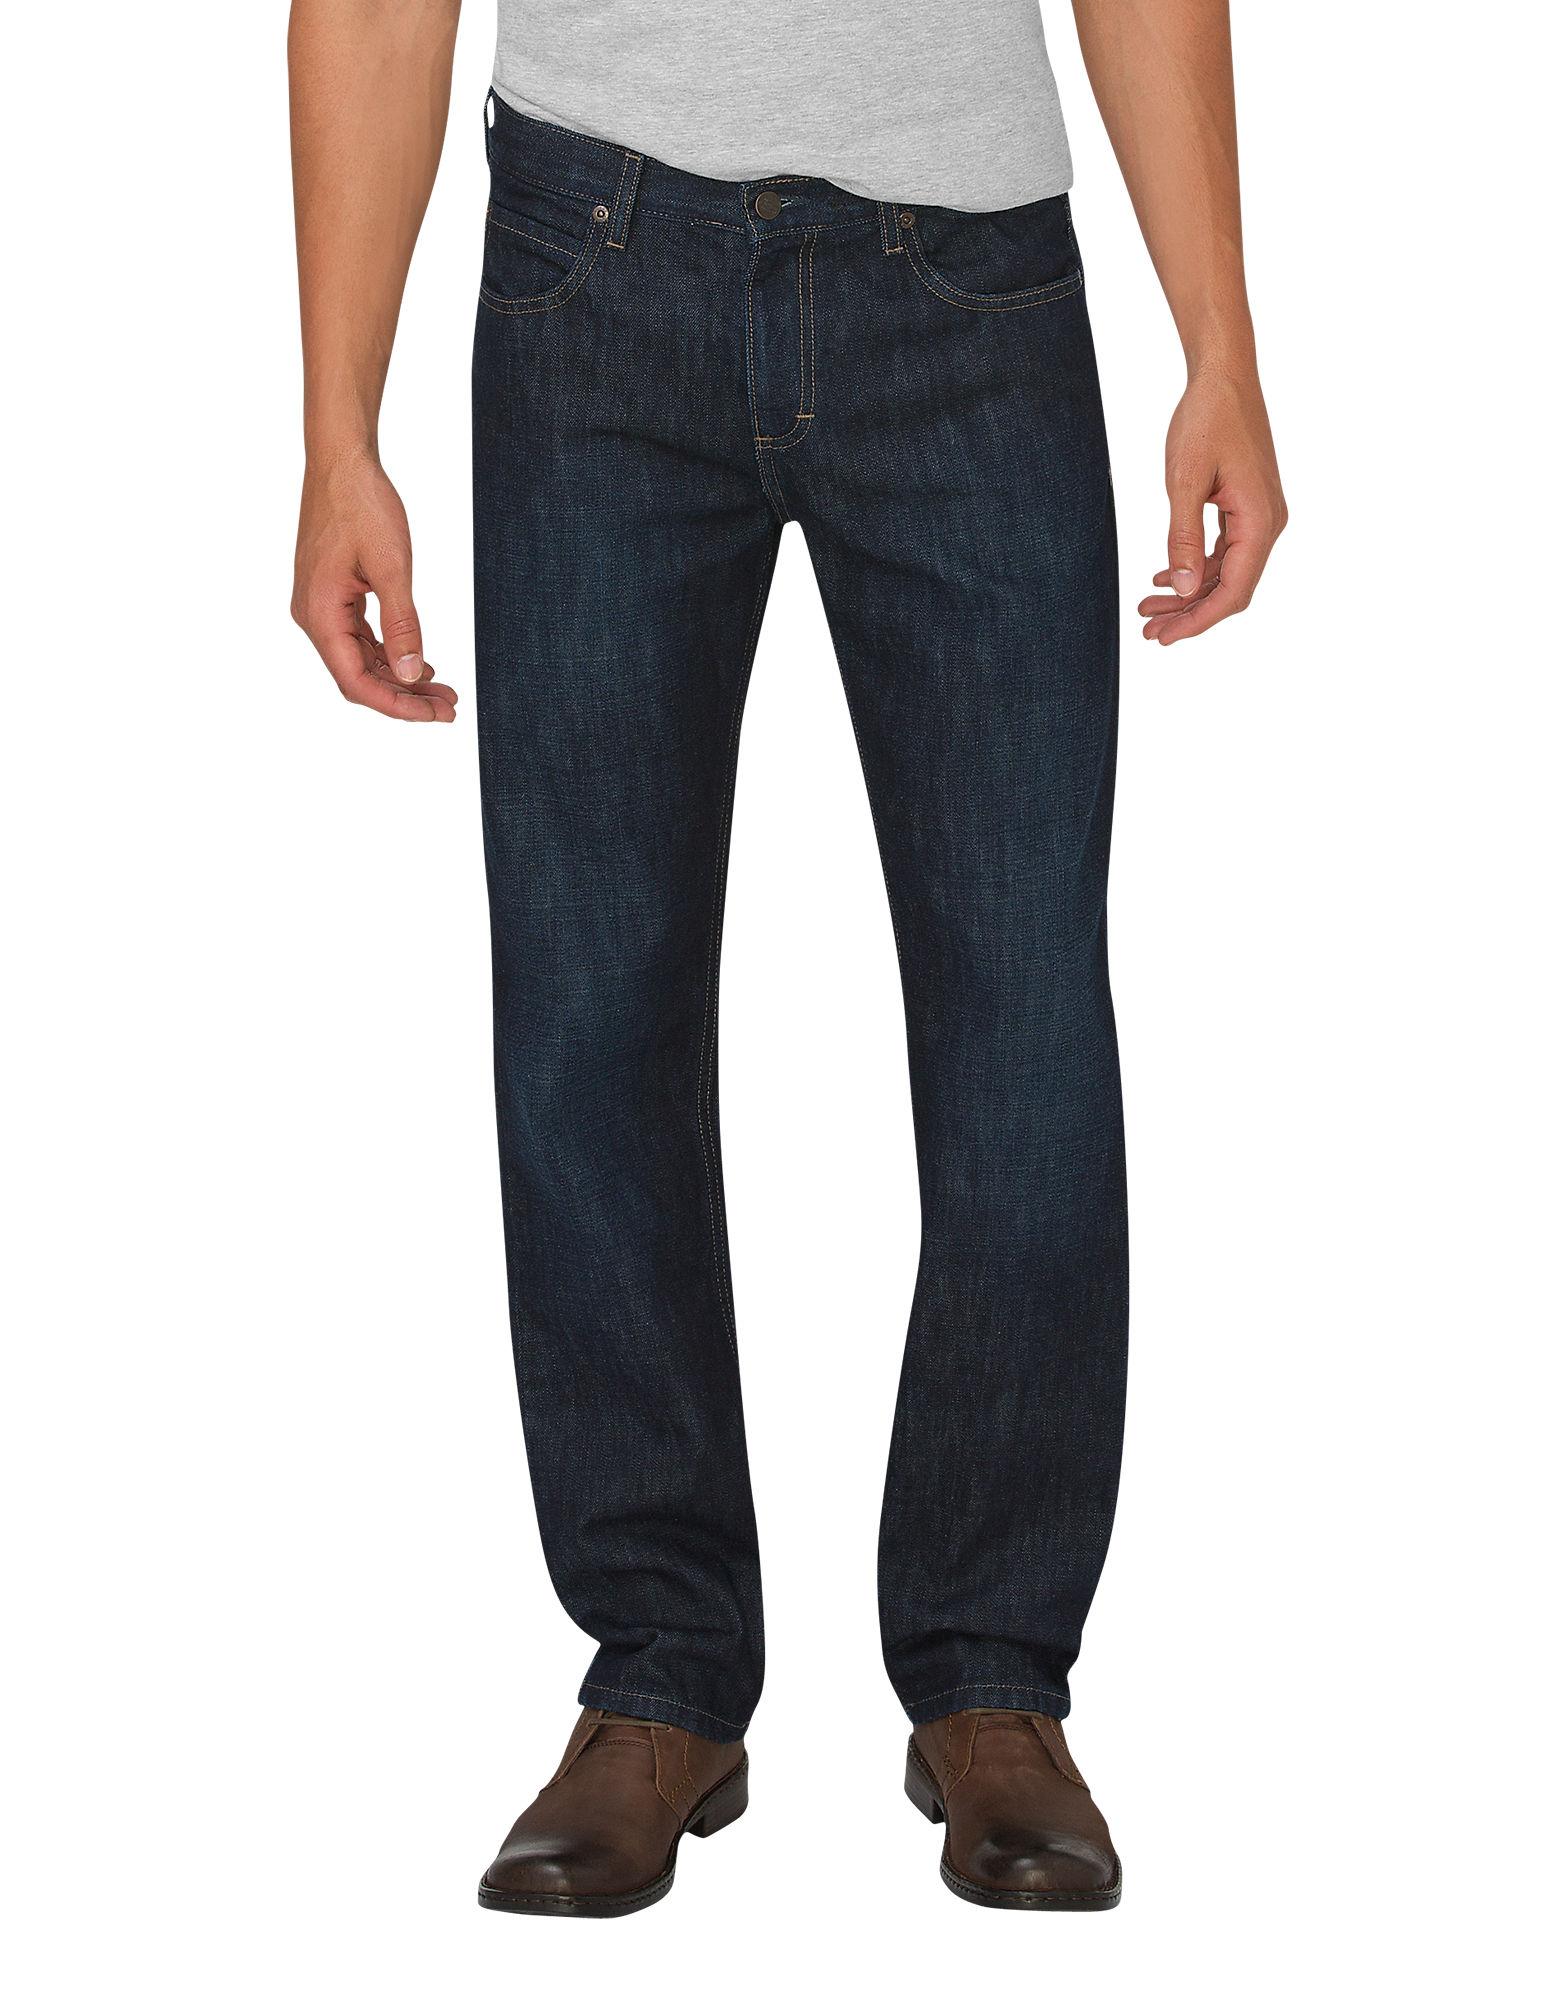 dickies-x-series-regular-fit-straight-leg-jeans